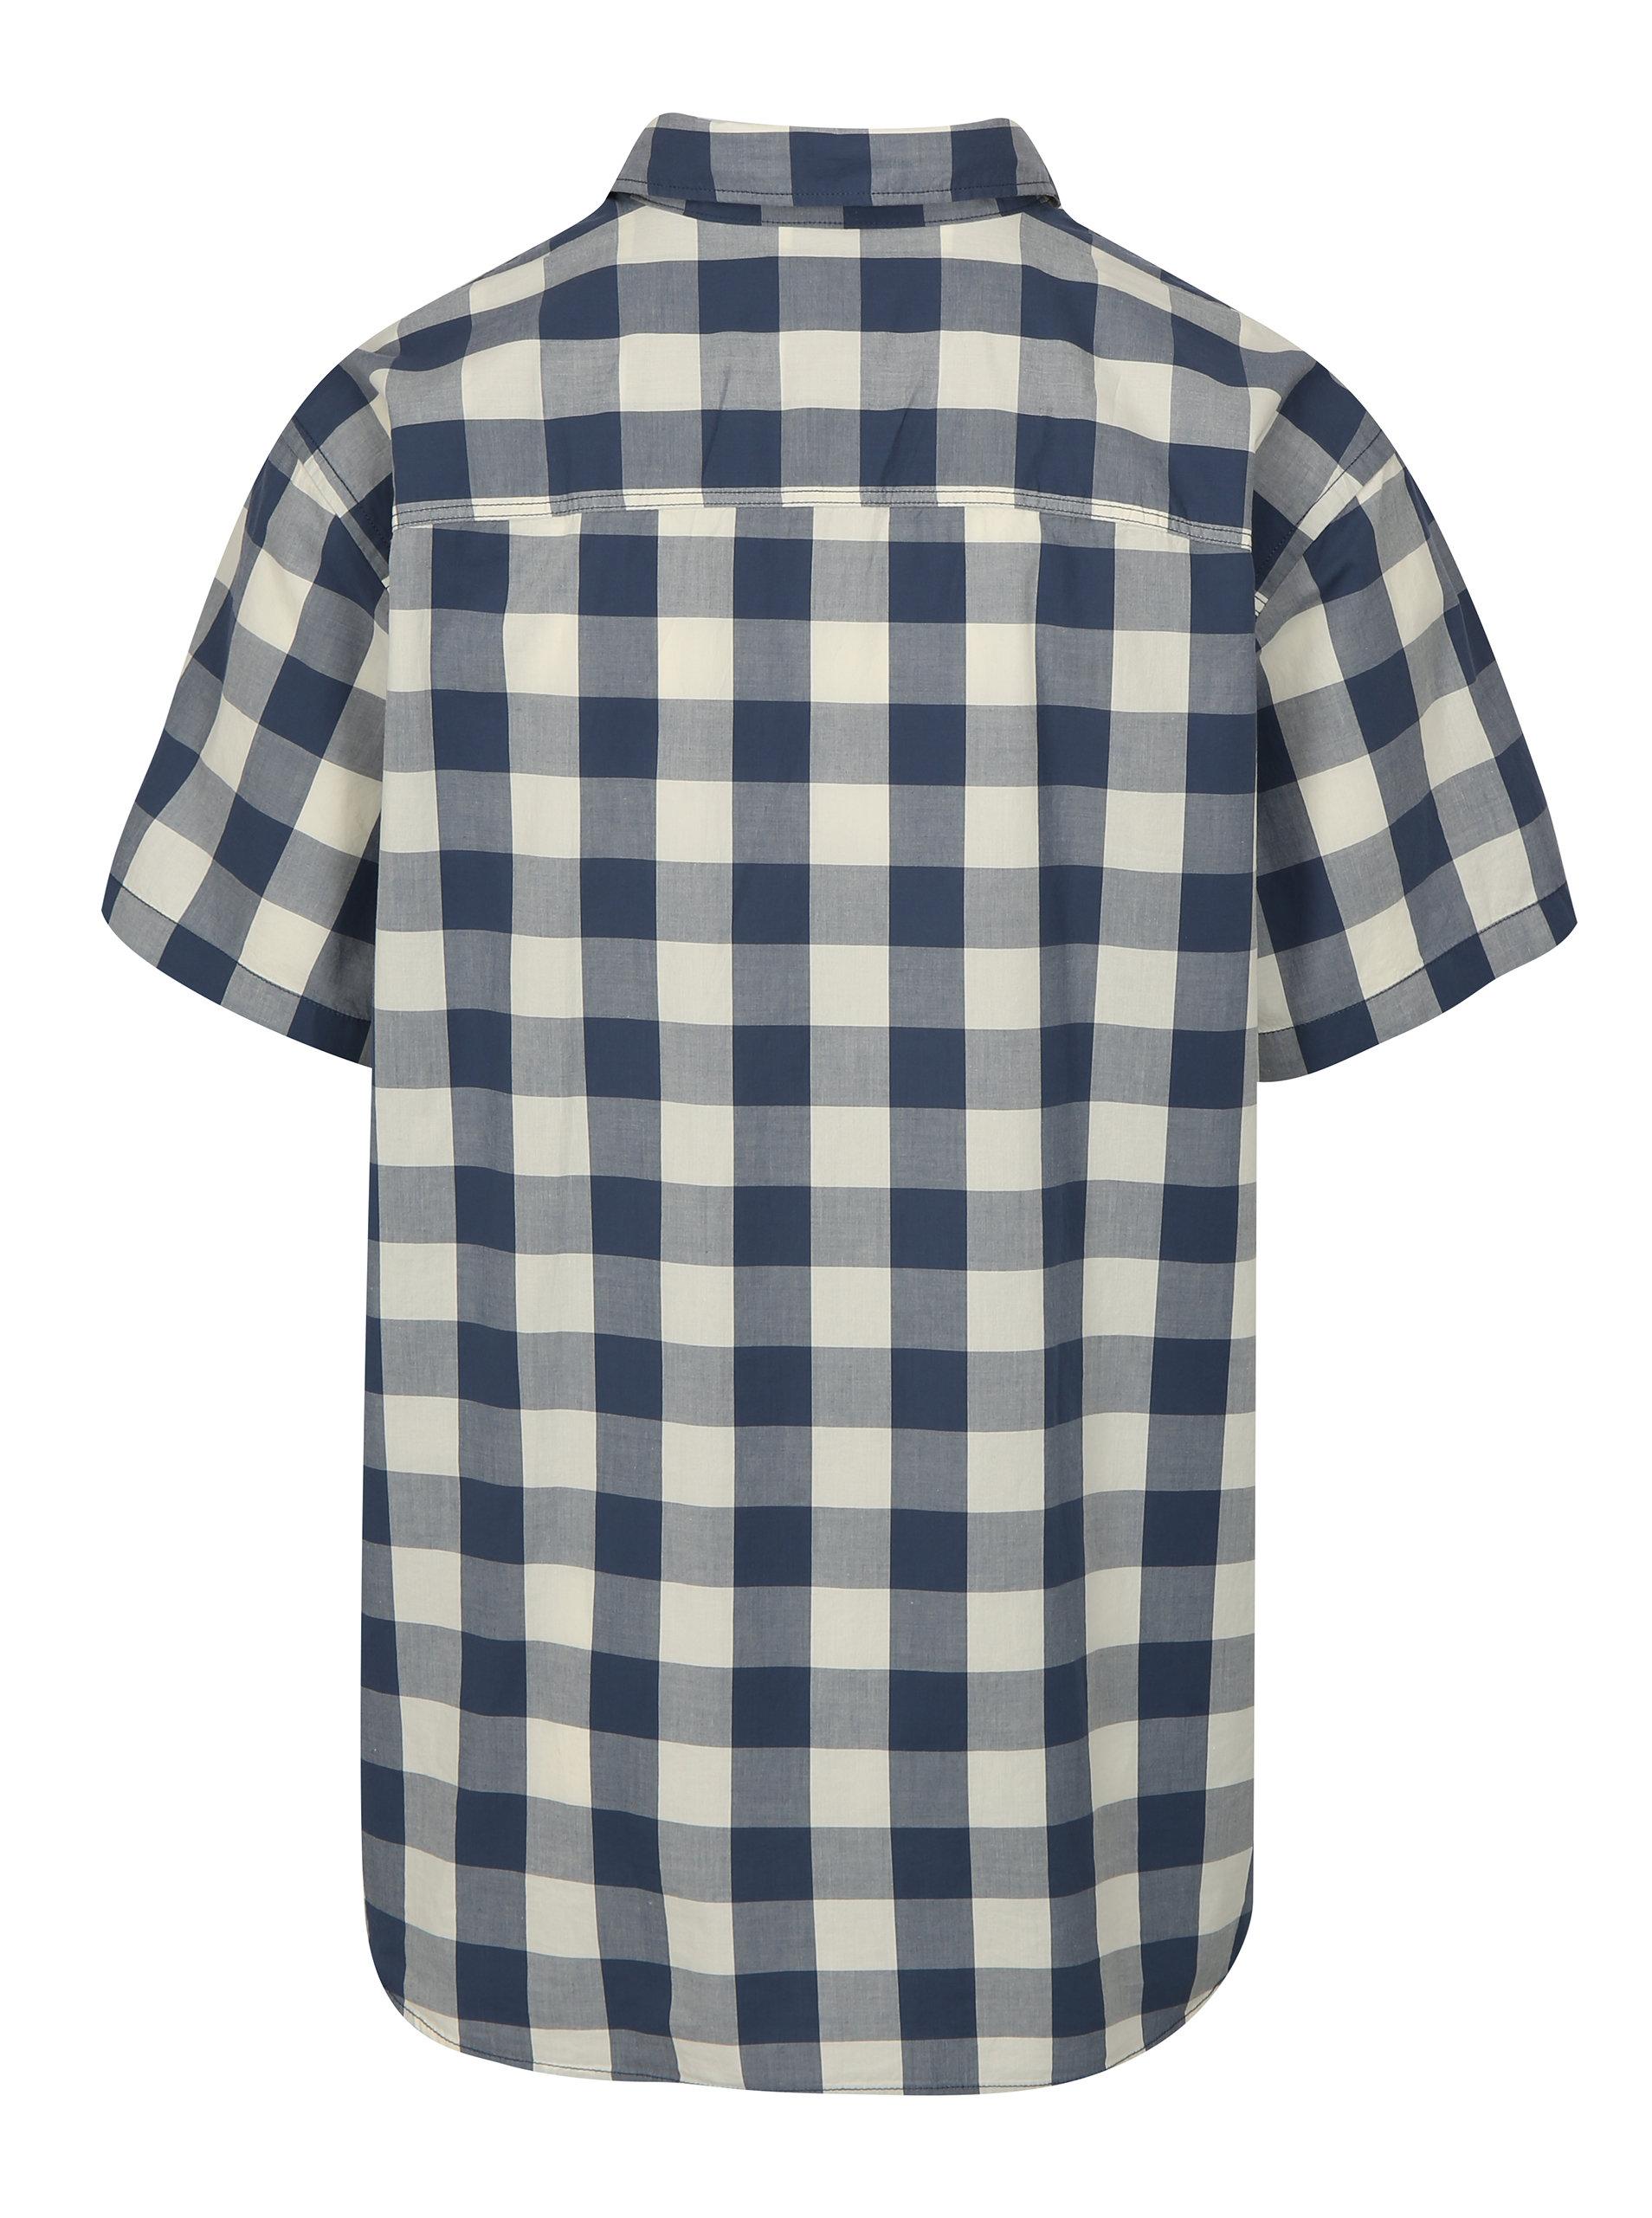 83ce814c1d79 Modro-biela kockovaná plus size košeľa Jack   Jones Boise ...